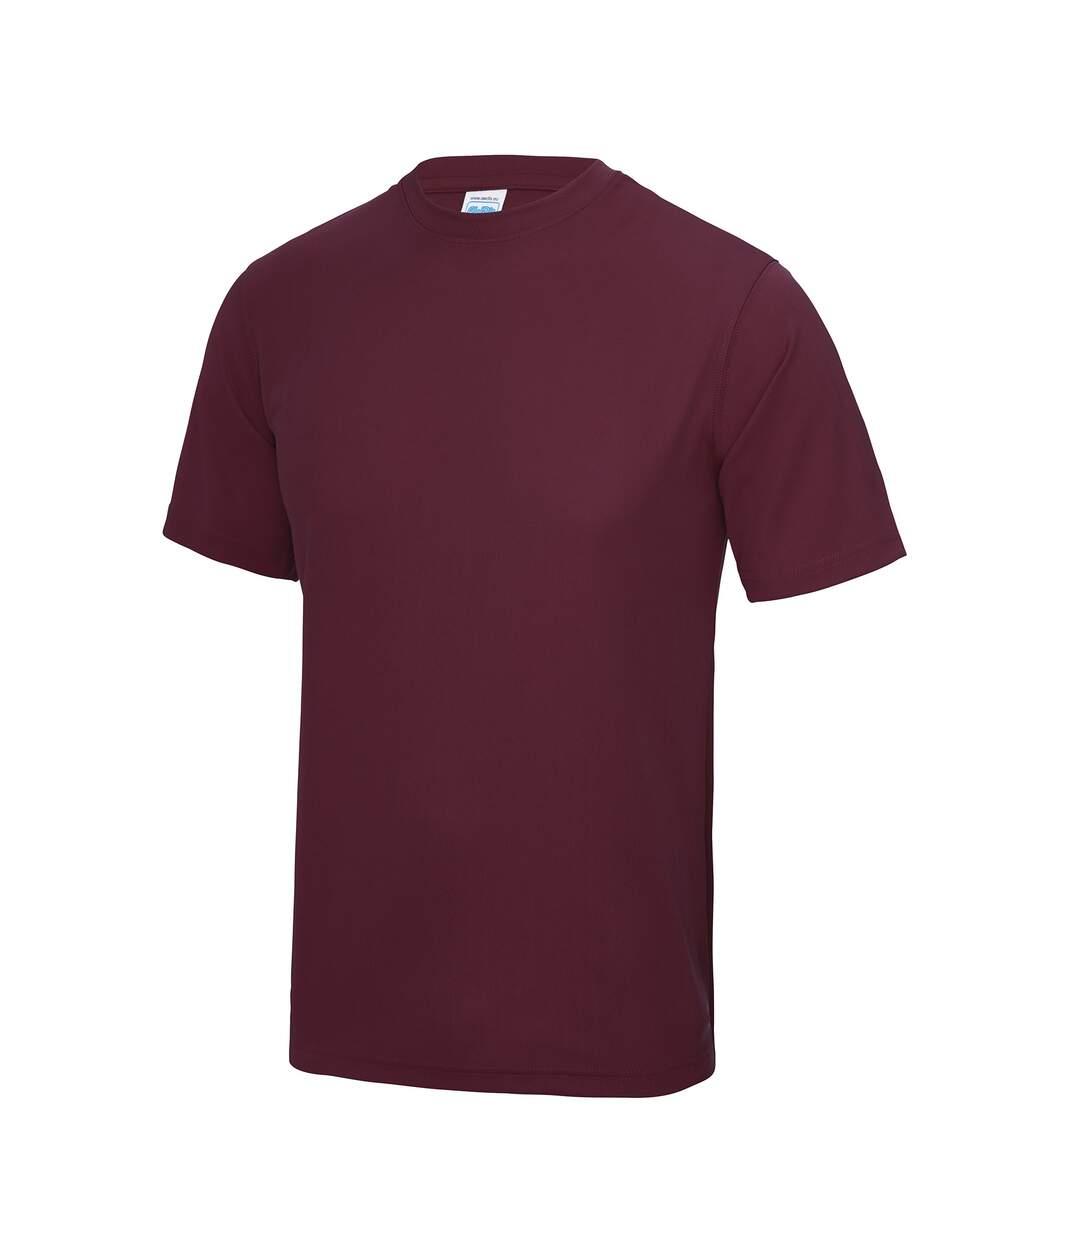 AWDis Just Cool Mens Performance Plain T-Shirt (Burgundy) - UTRW683